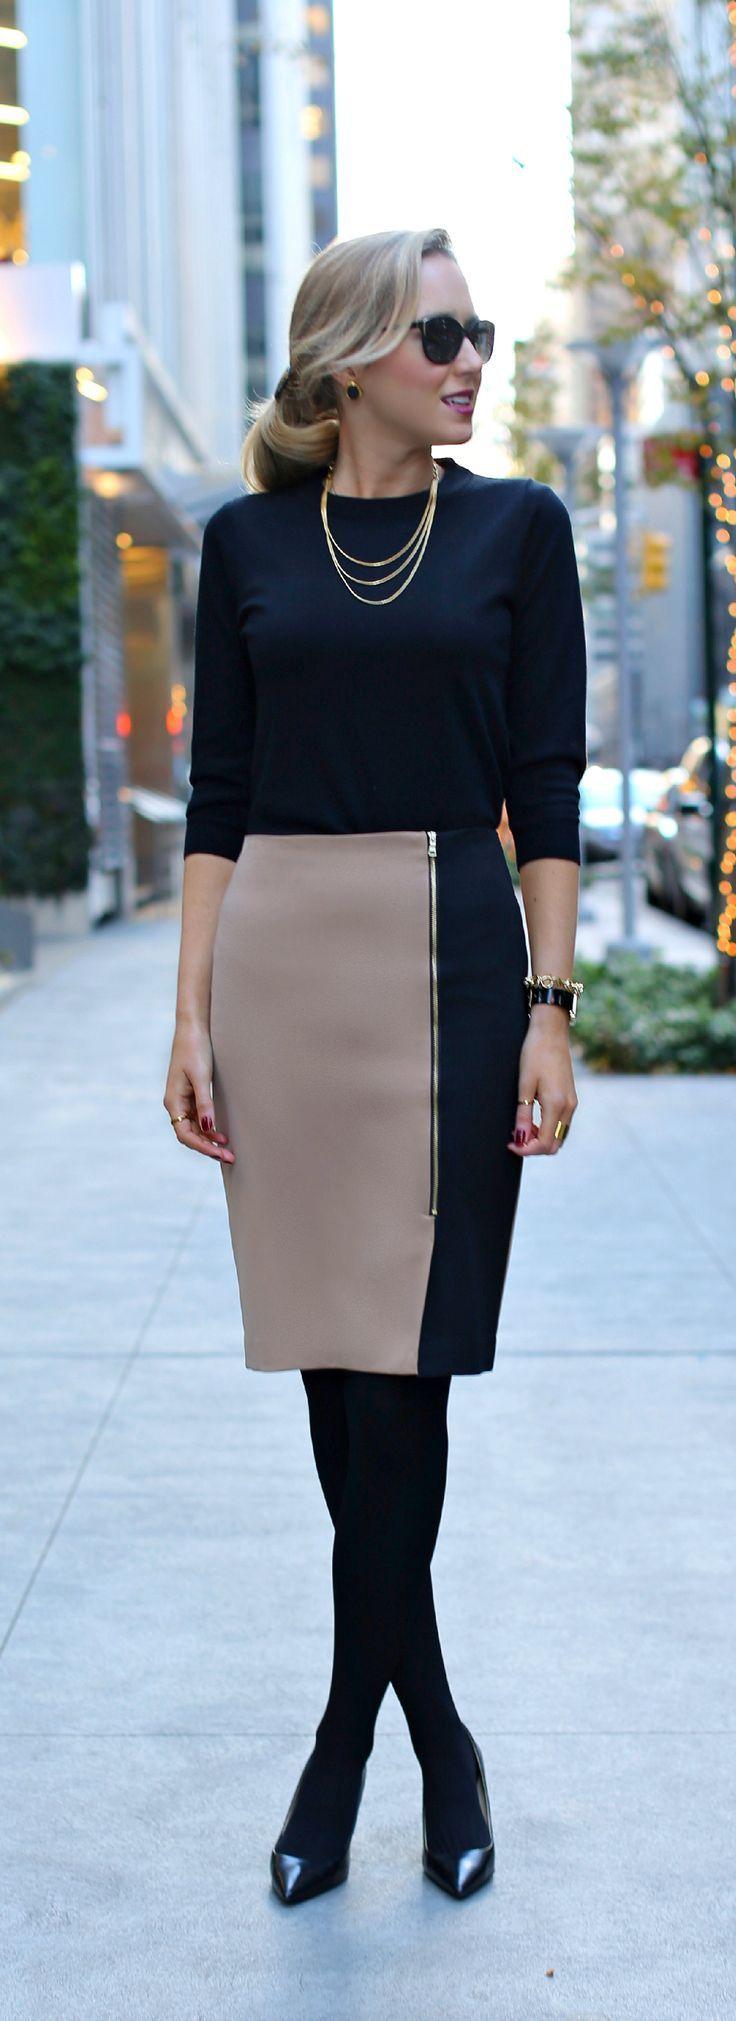 Black dress we heart it - Classy All Black Office Attire